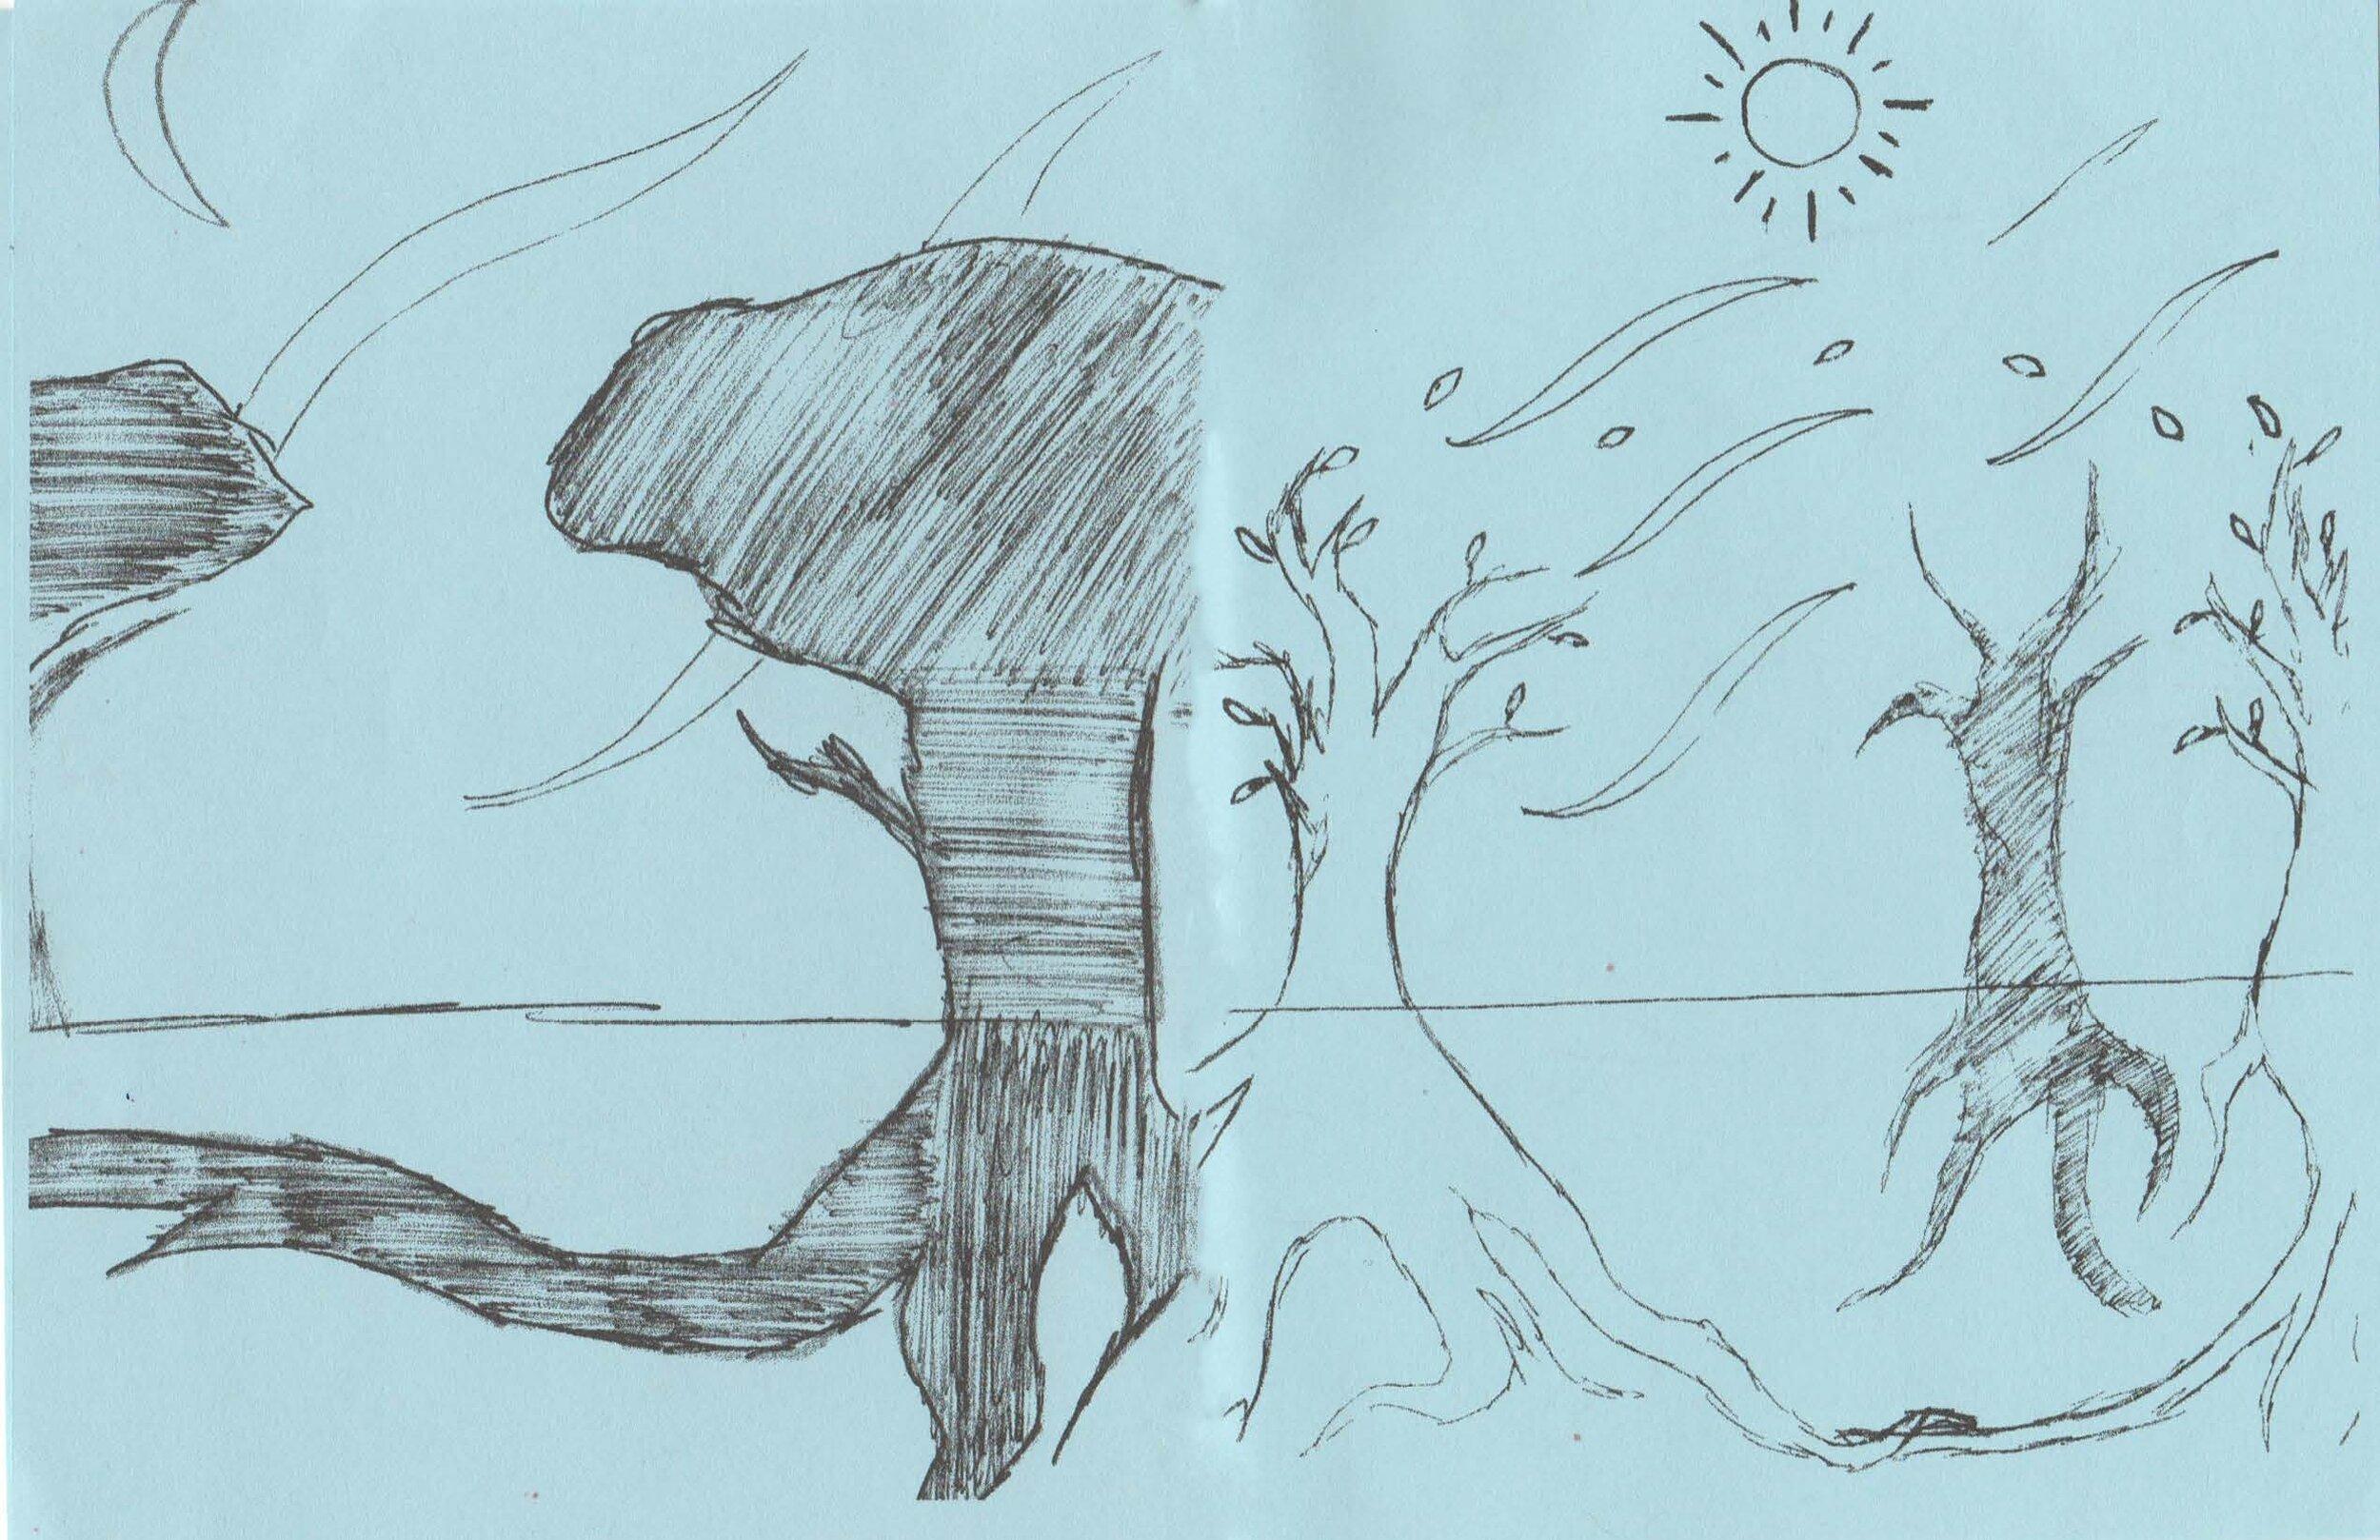 Windy Love_Page_5_Image_0001.jpg